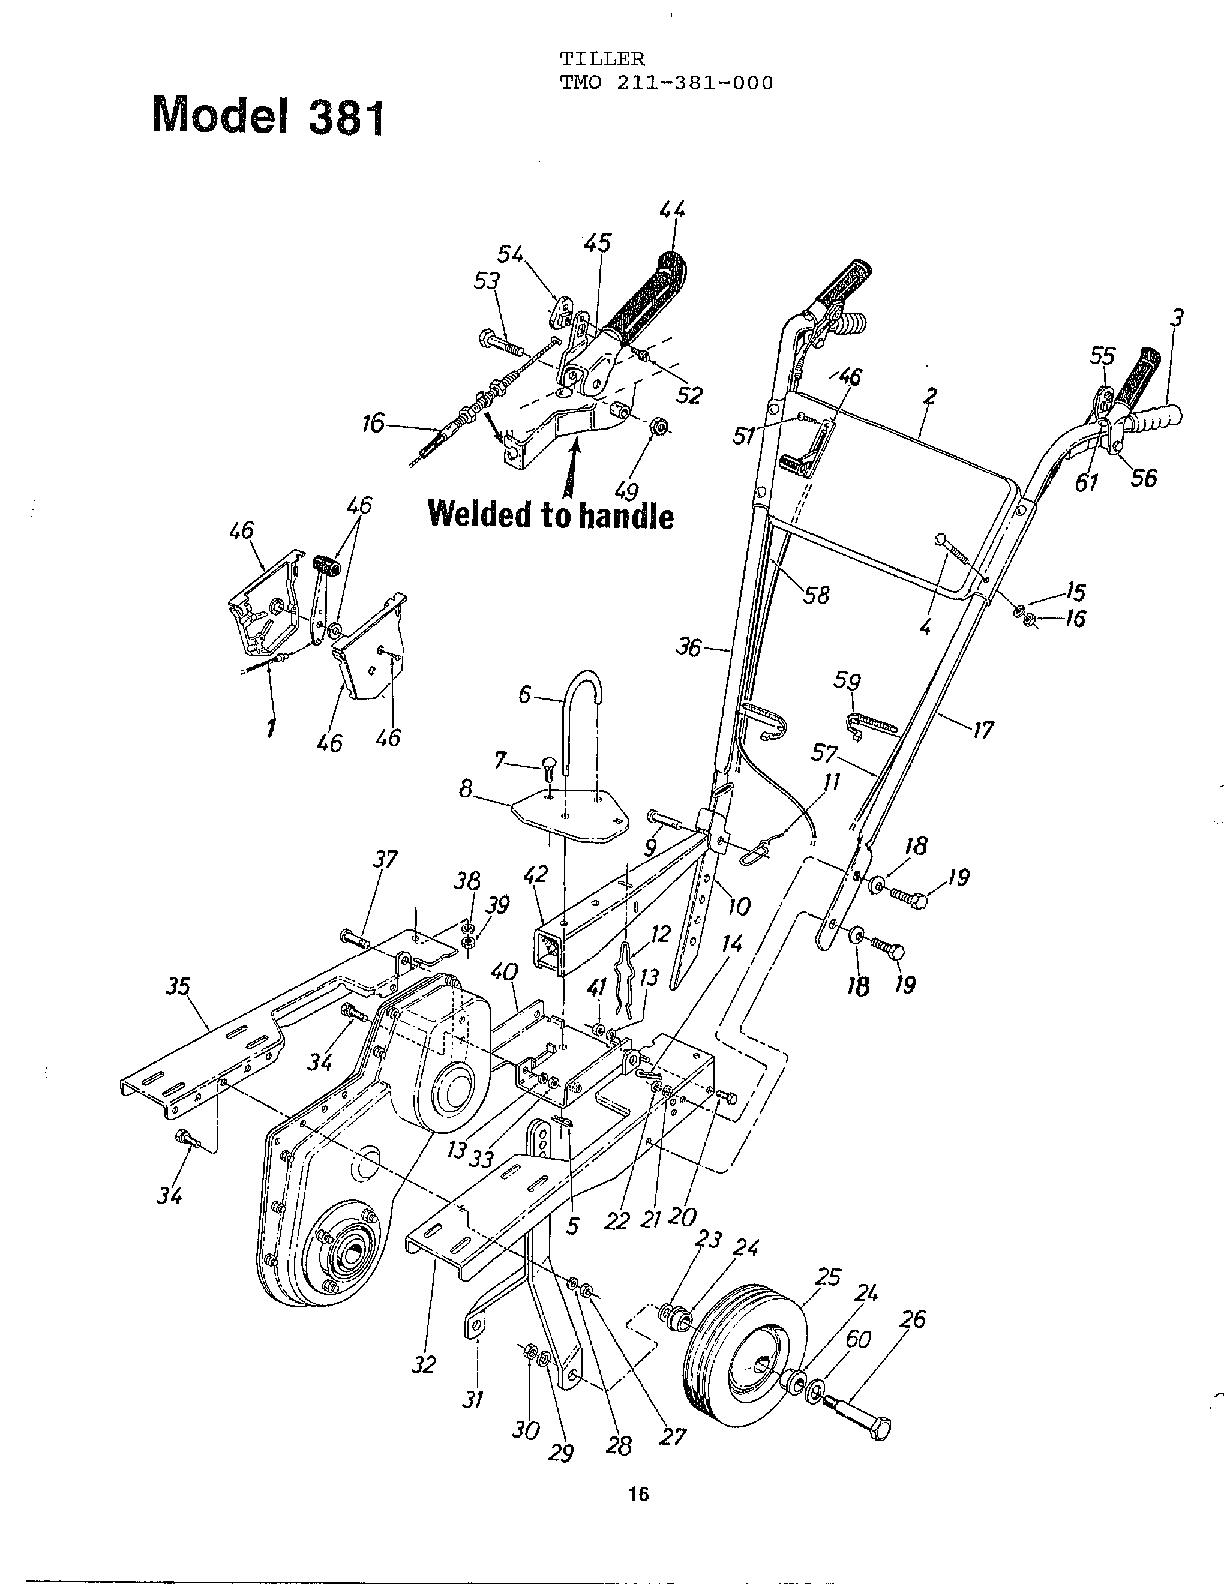 Mtd model 211-381-000 rear tine, gas tiller genuine parts